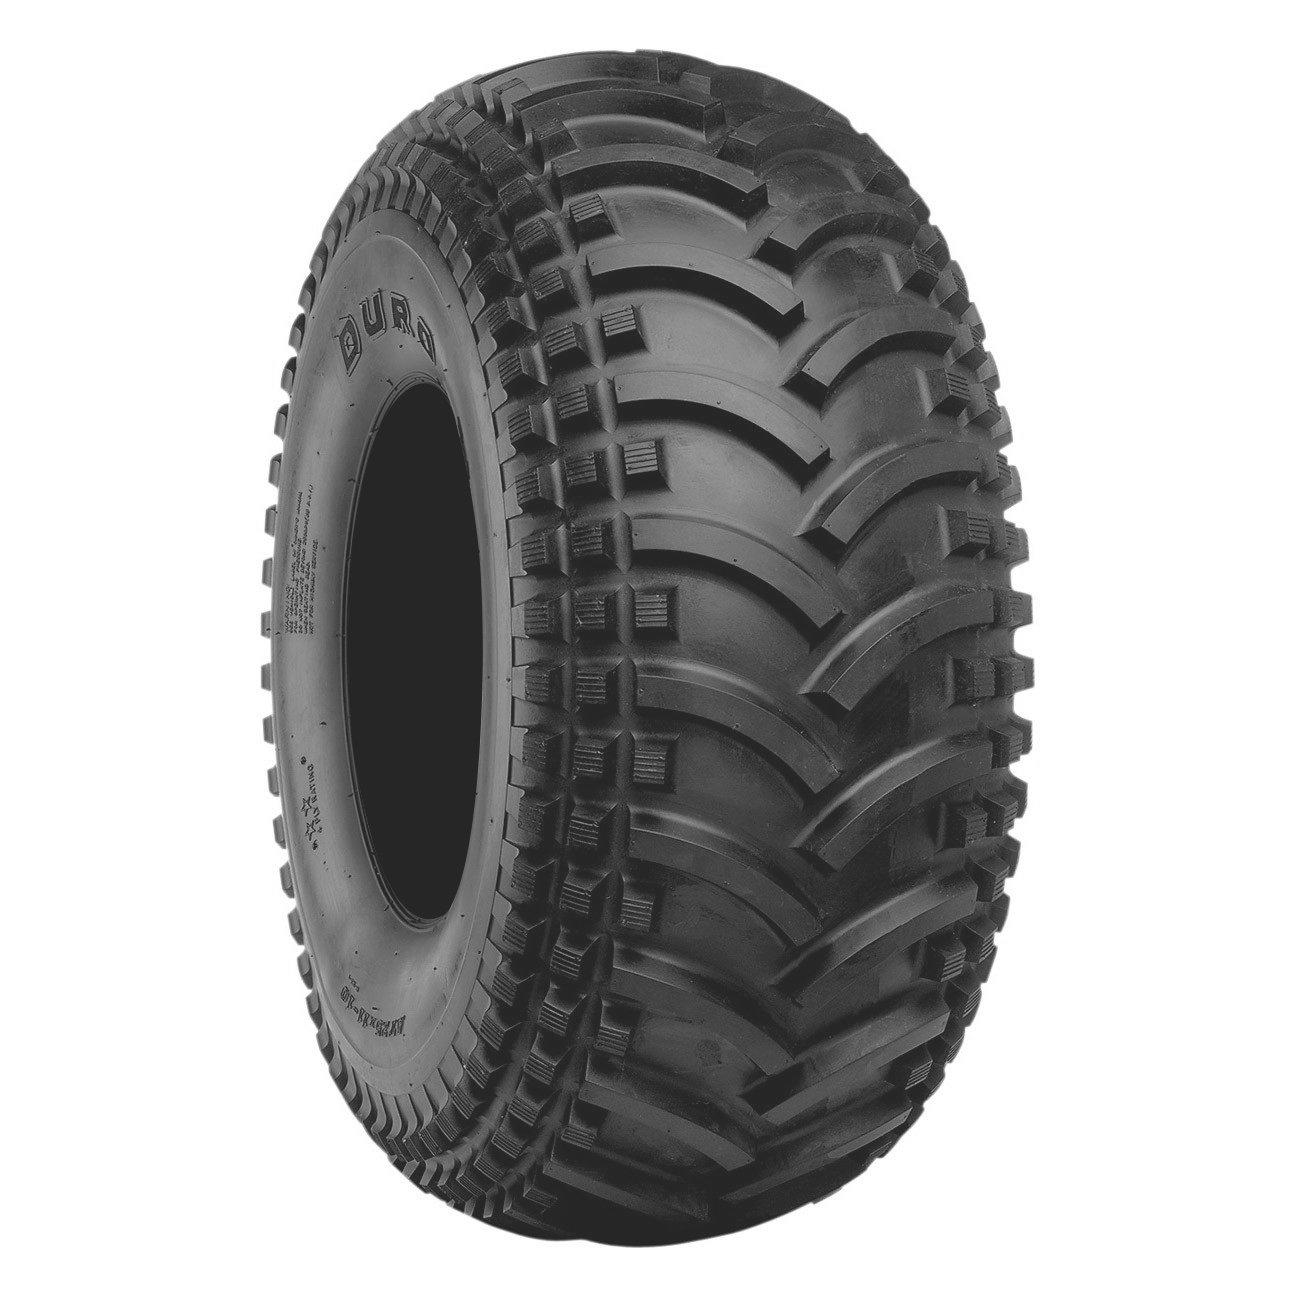 Duro HF243 Tire - Front/Rear - 22x11x8 , Position: Front/Rear, Tire Size: 22x11x8, Rim Size: 8, Tire Ply: 2, Tire Type: ATV/UTV, Tire Application: Mud/Snow